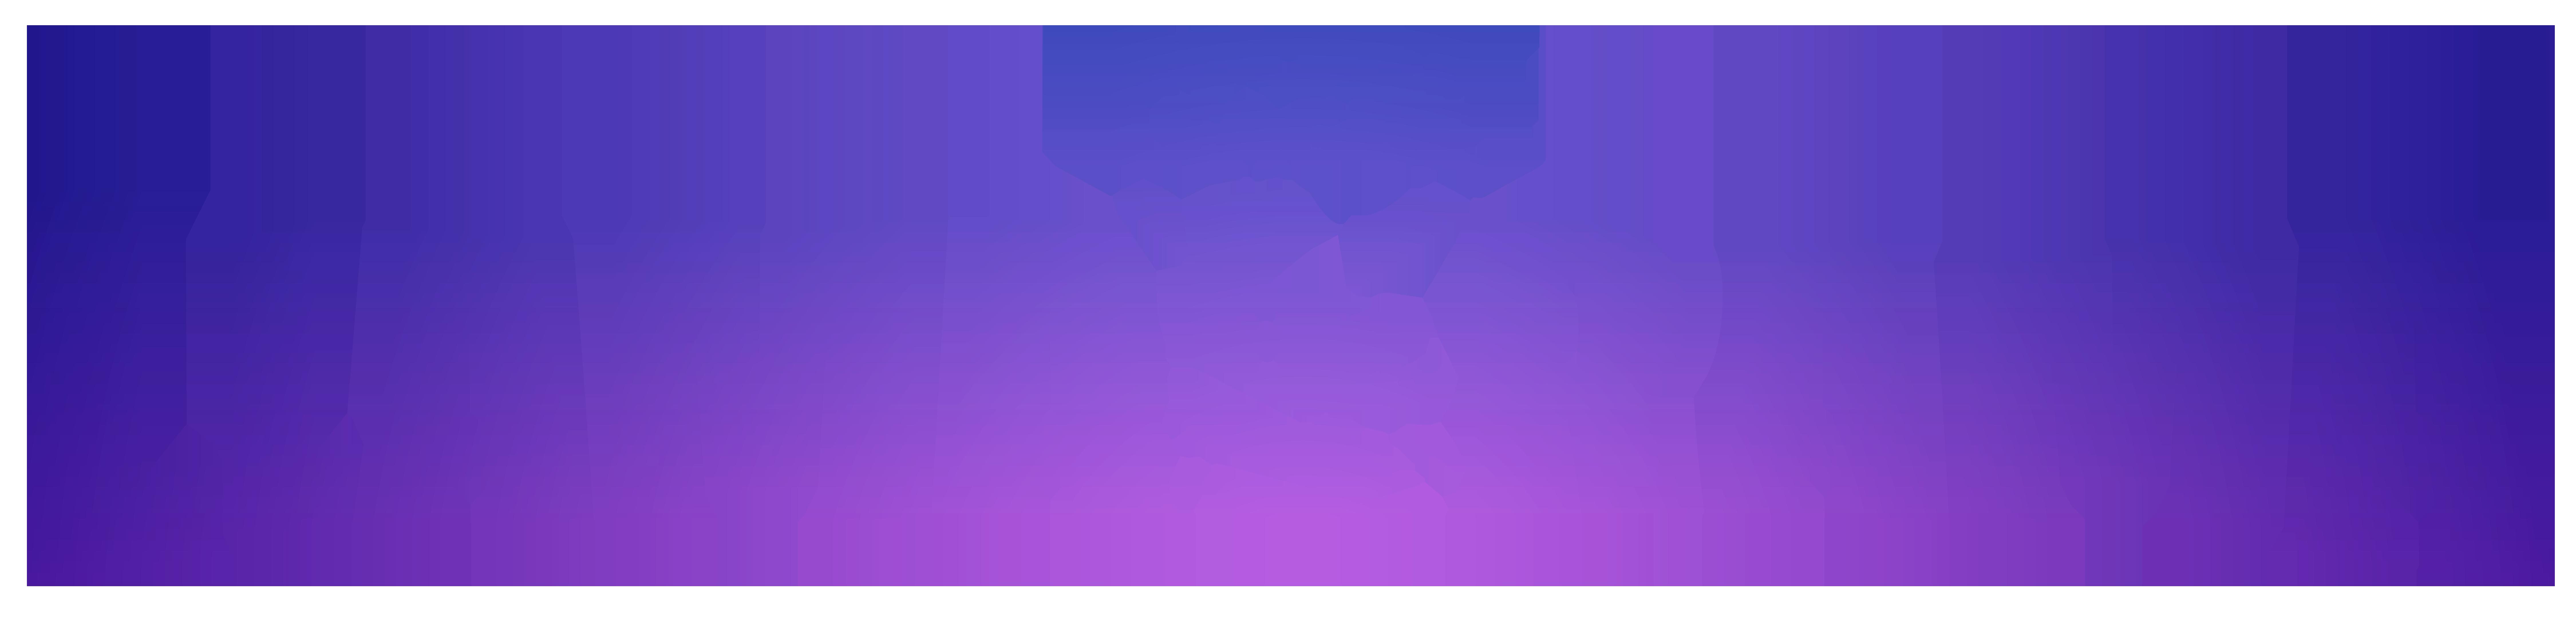 IMAGE(https://rocketleague.media.zestyio.com/rl_llama-rama_Logo_Gradient.png)